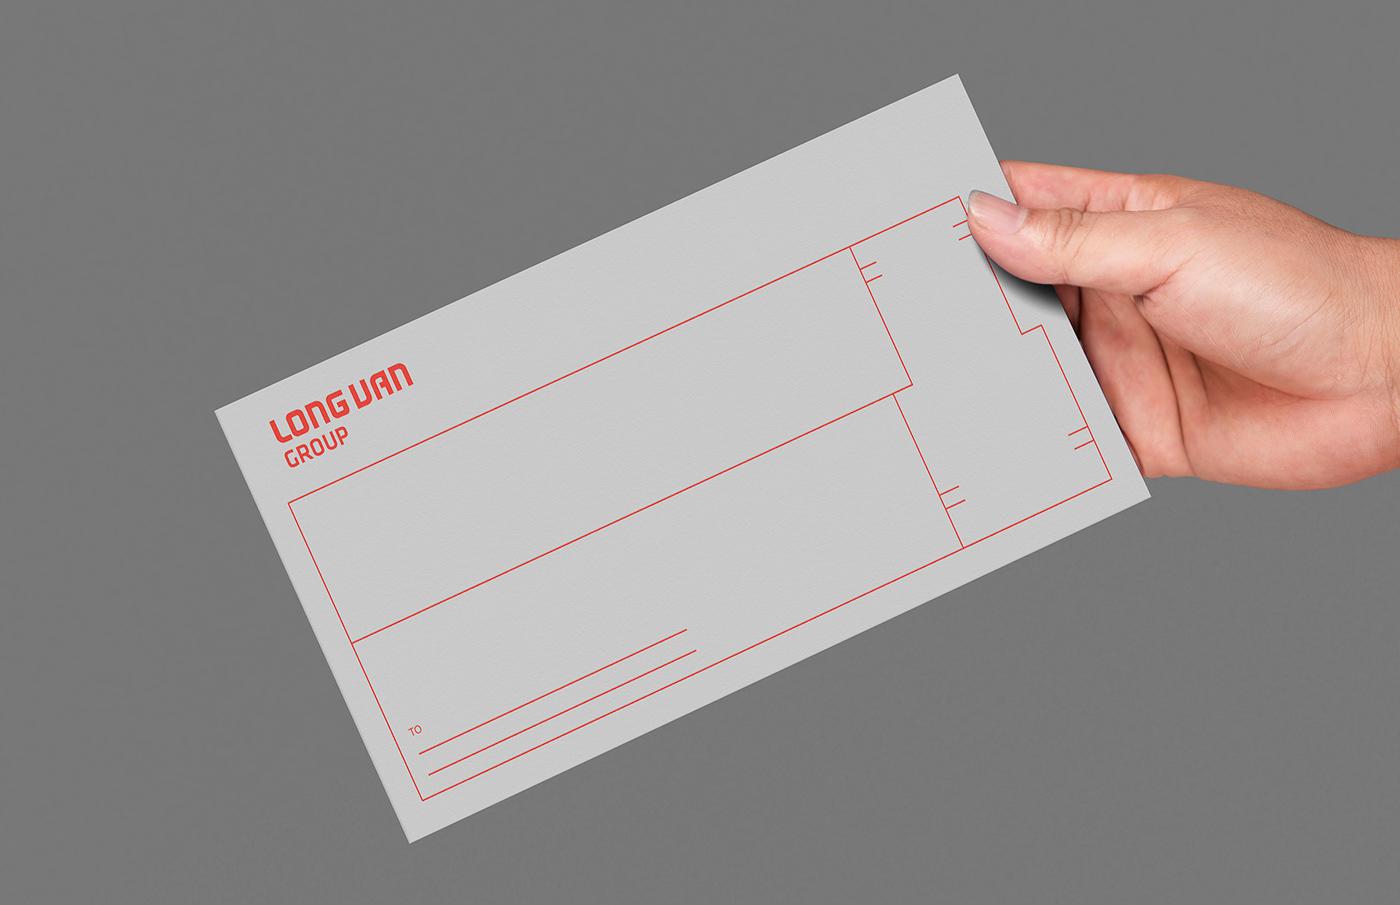 branding agency vietnam bratus agency bratus studio vietnam visual identity Corporate Identity jimmi tuan logo designer vietnam Stationary design